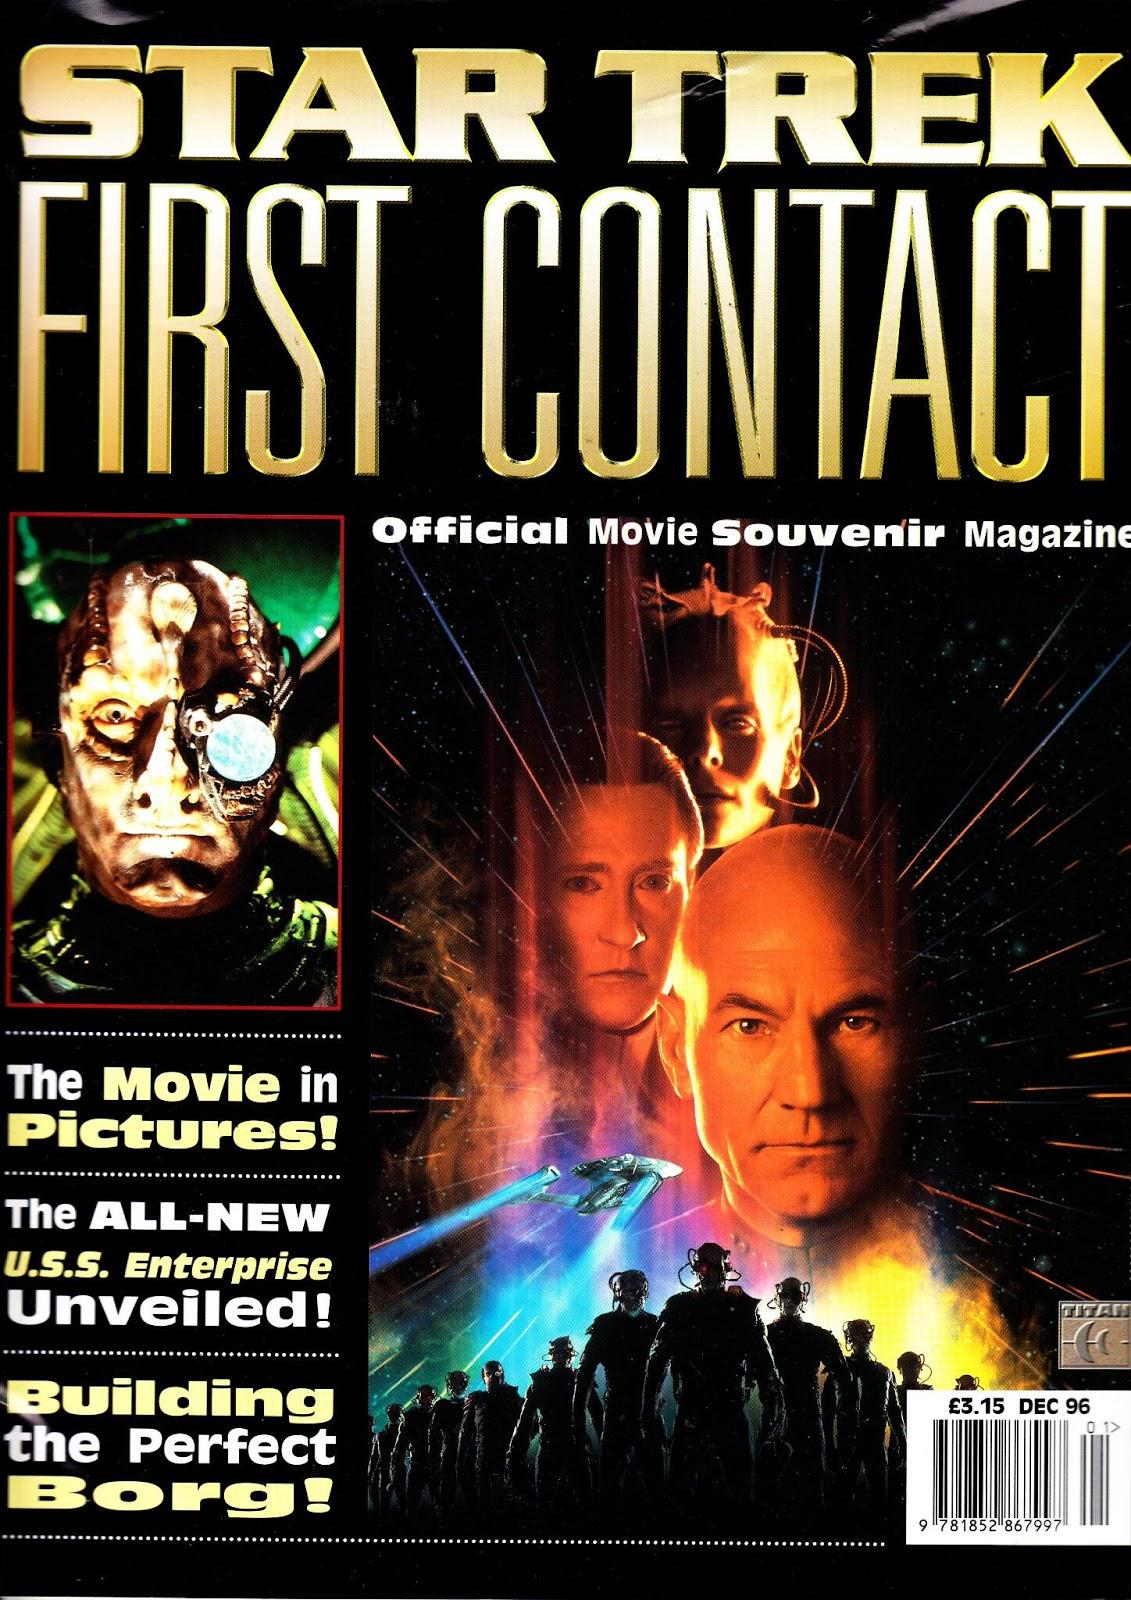 Star Trek First Contact Official Movie Magazine cover.jpg. Star Trek First  Contact Official Movie Magazine cover.jpg